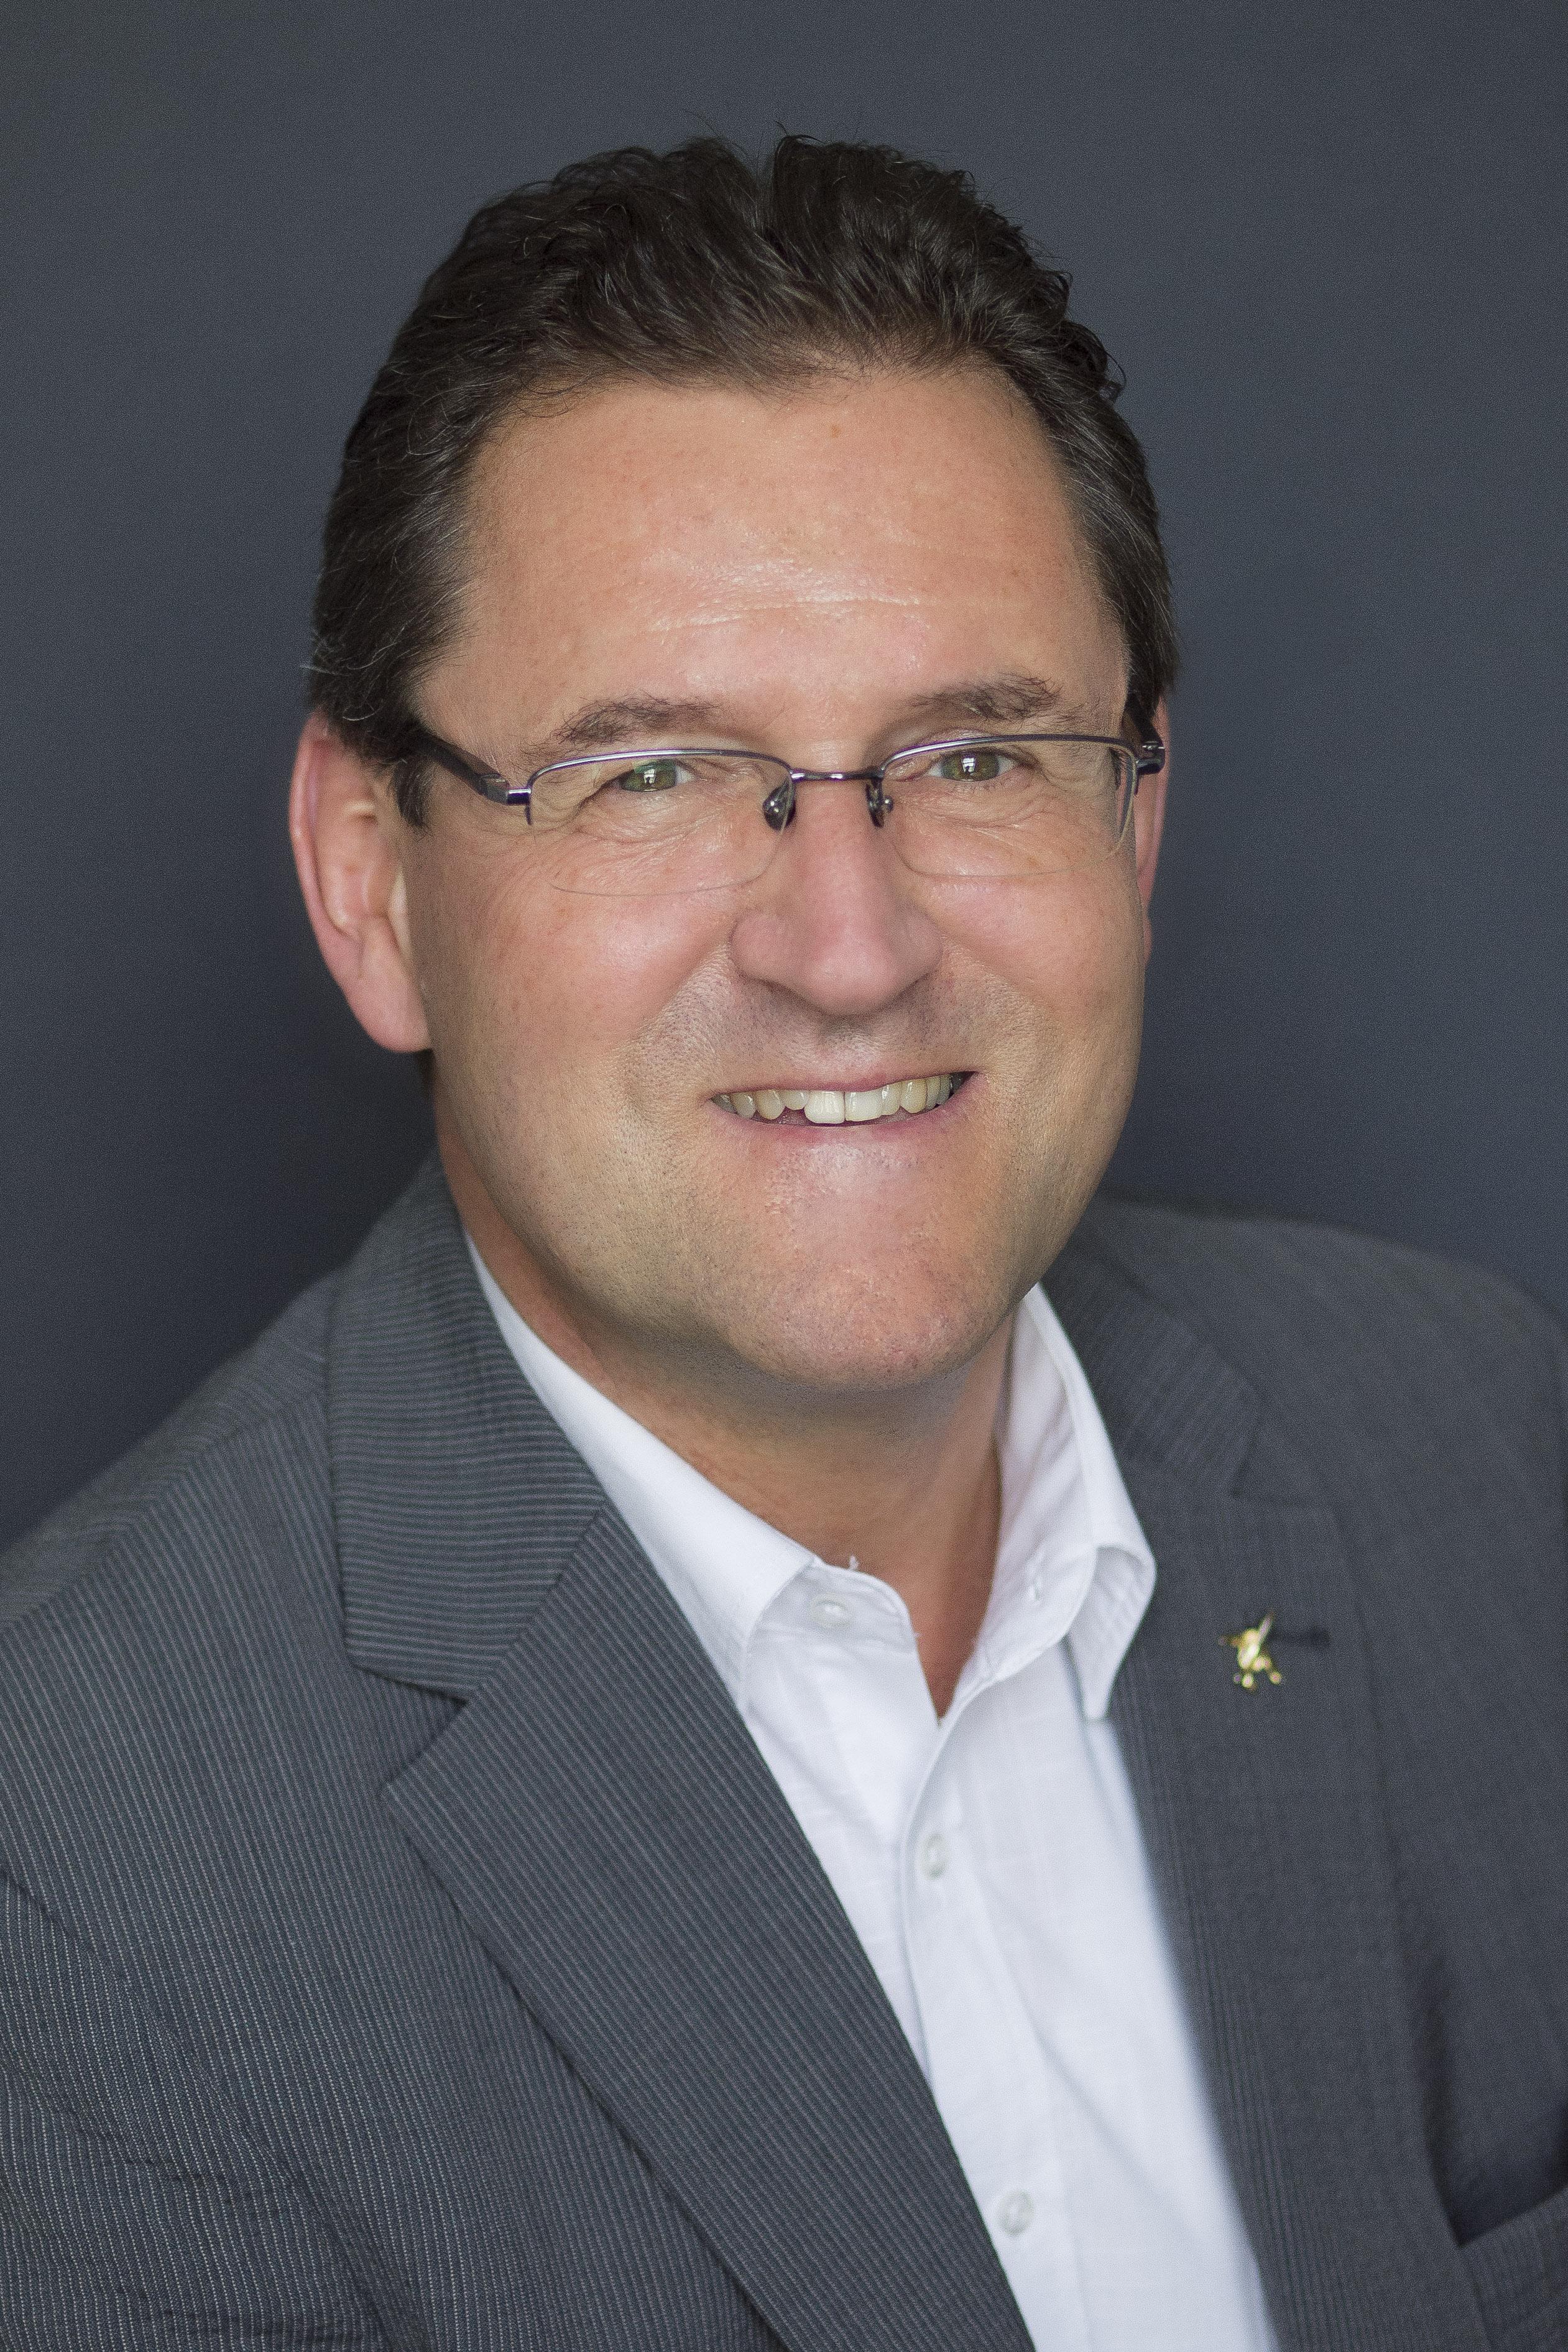 Richard Schneider, Vice President R&D - Bombardier Transportation